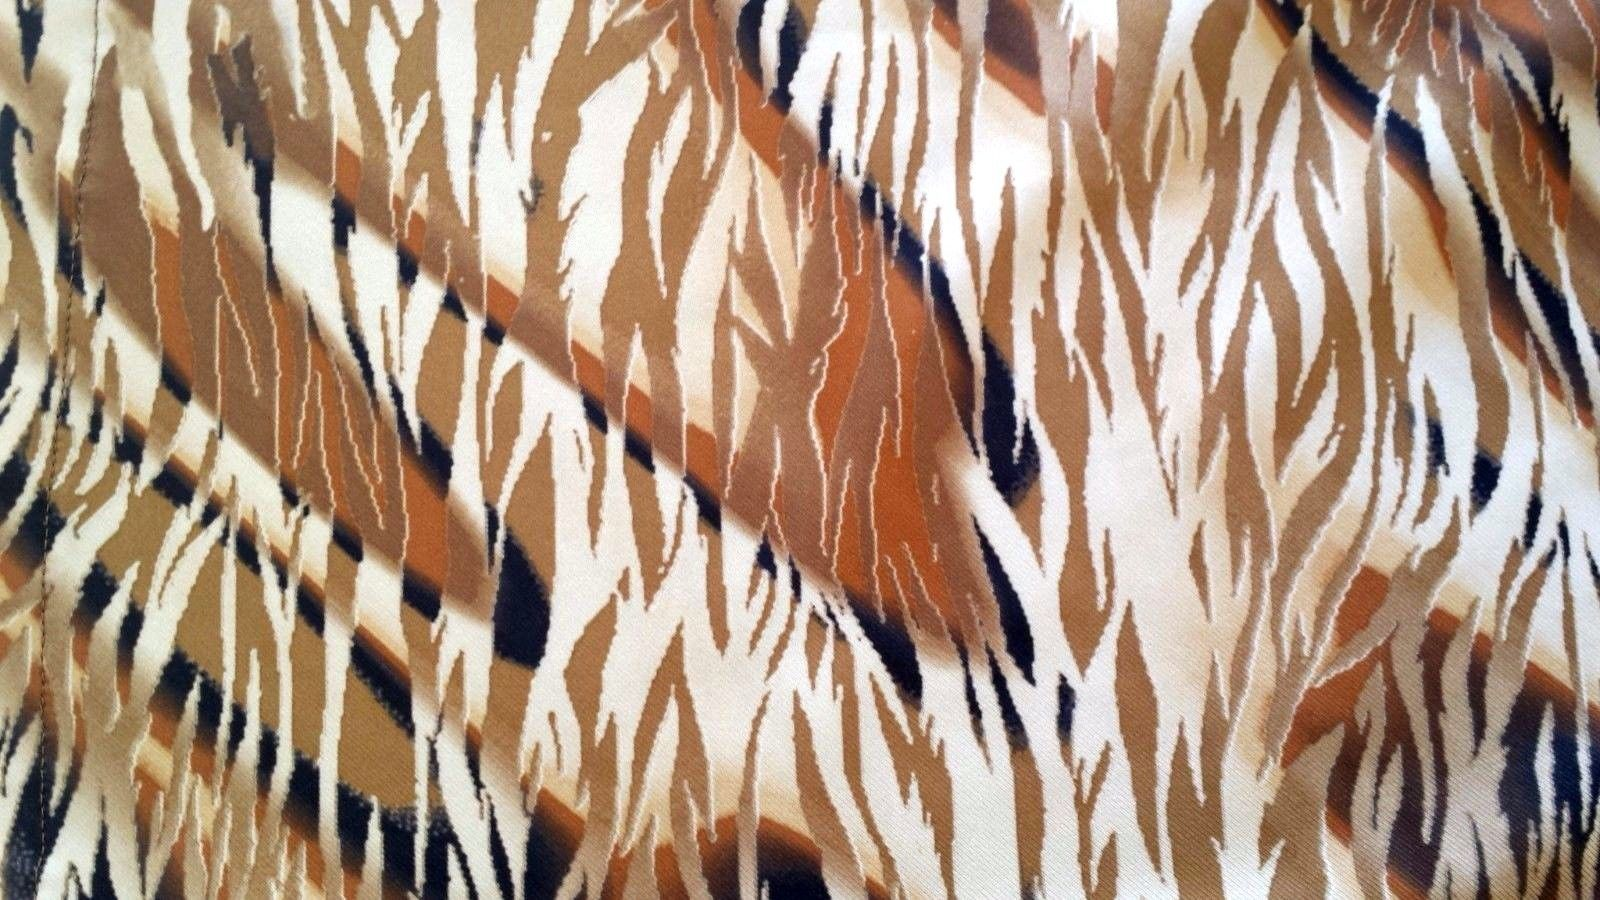 Stylish Golf/Casual Animal Print Golf Dress with Shortie - GoldenWear image 7